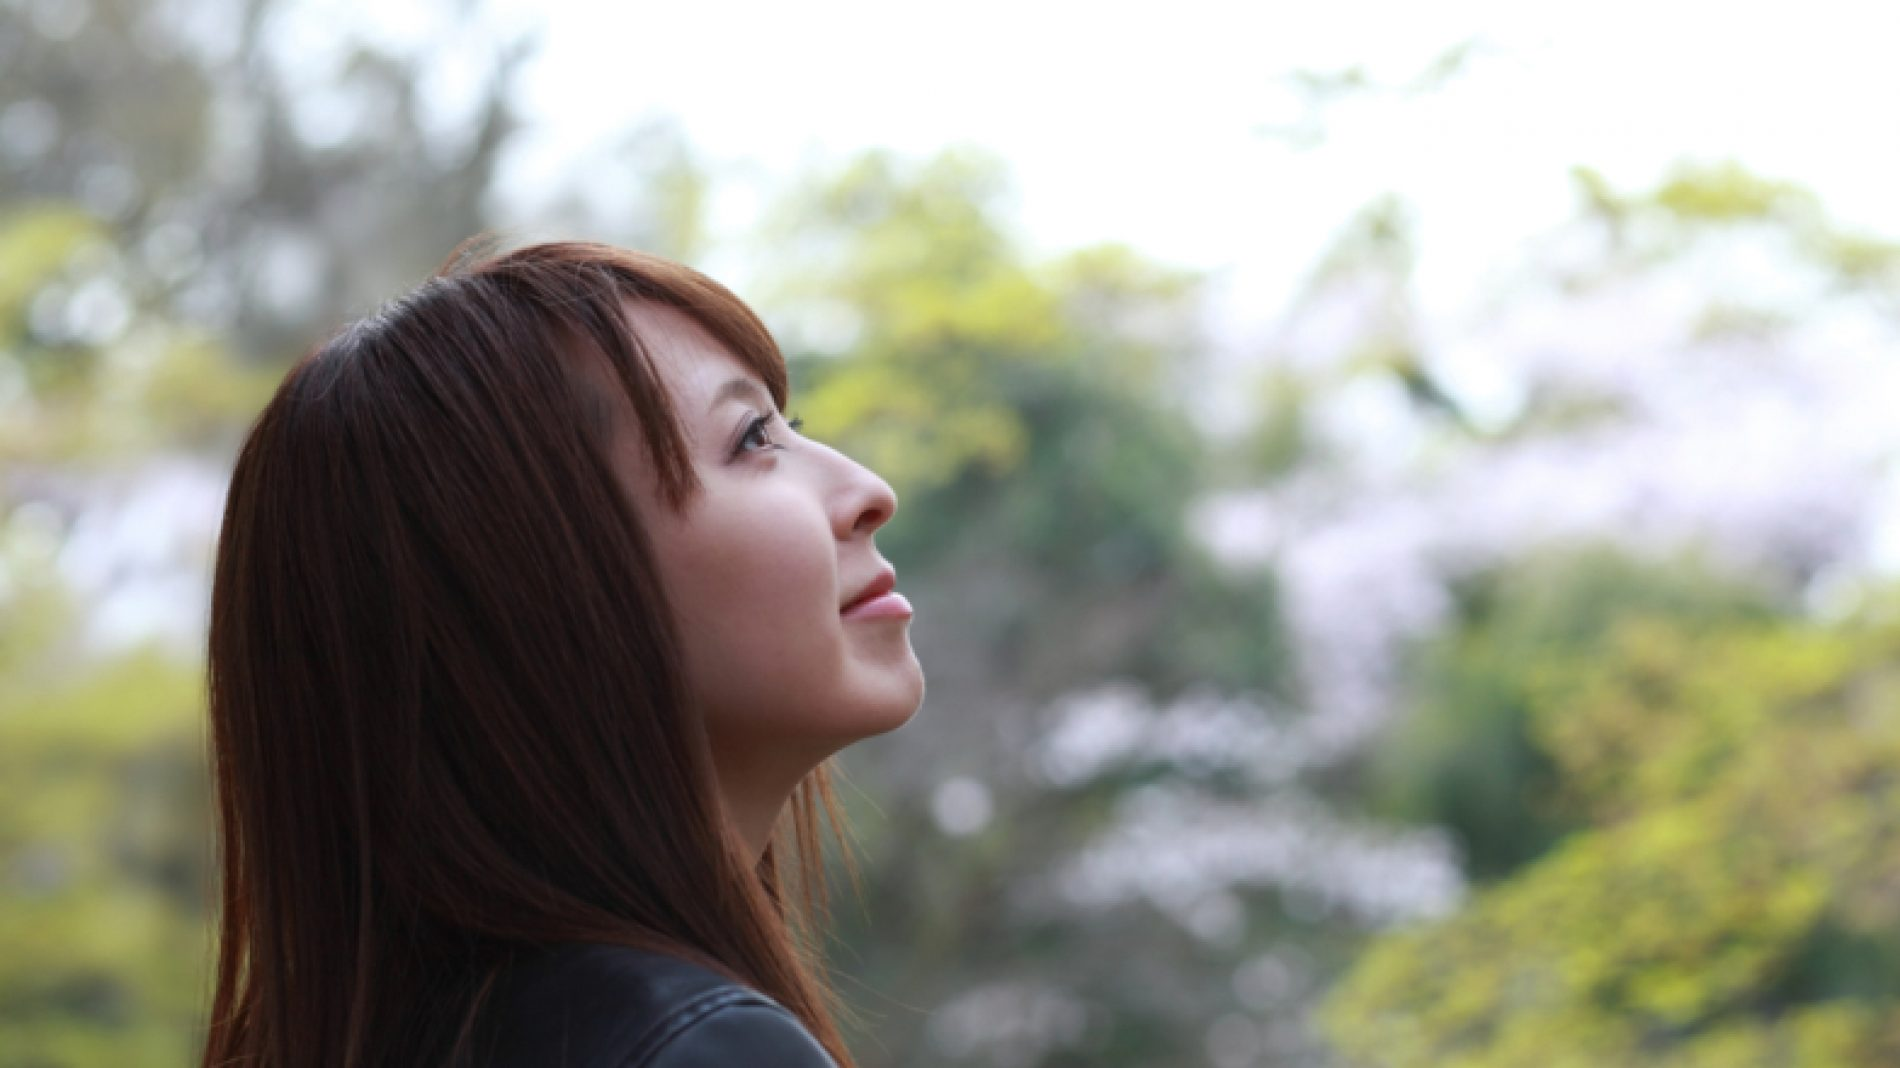 mindful-woman-0Obk30